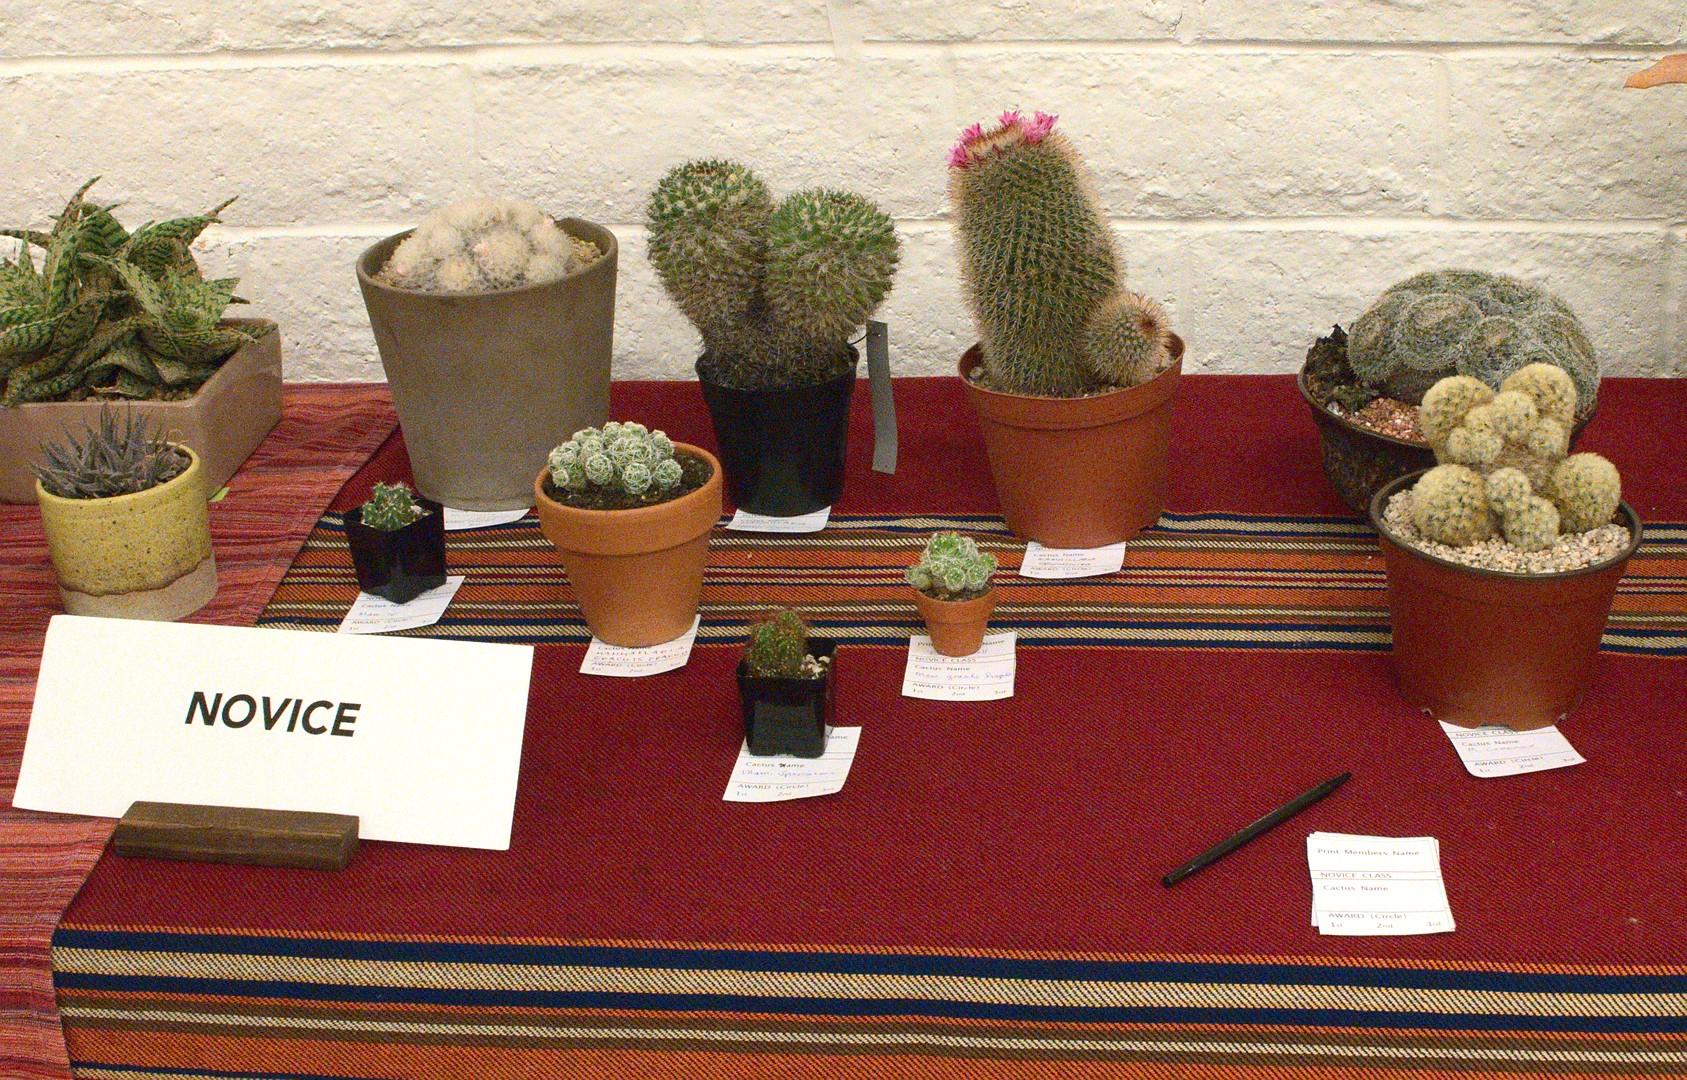 Novice Cactus